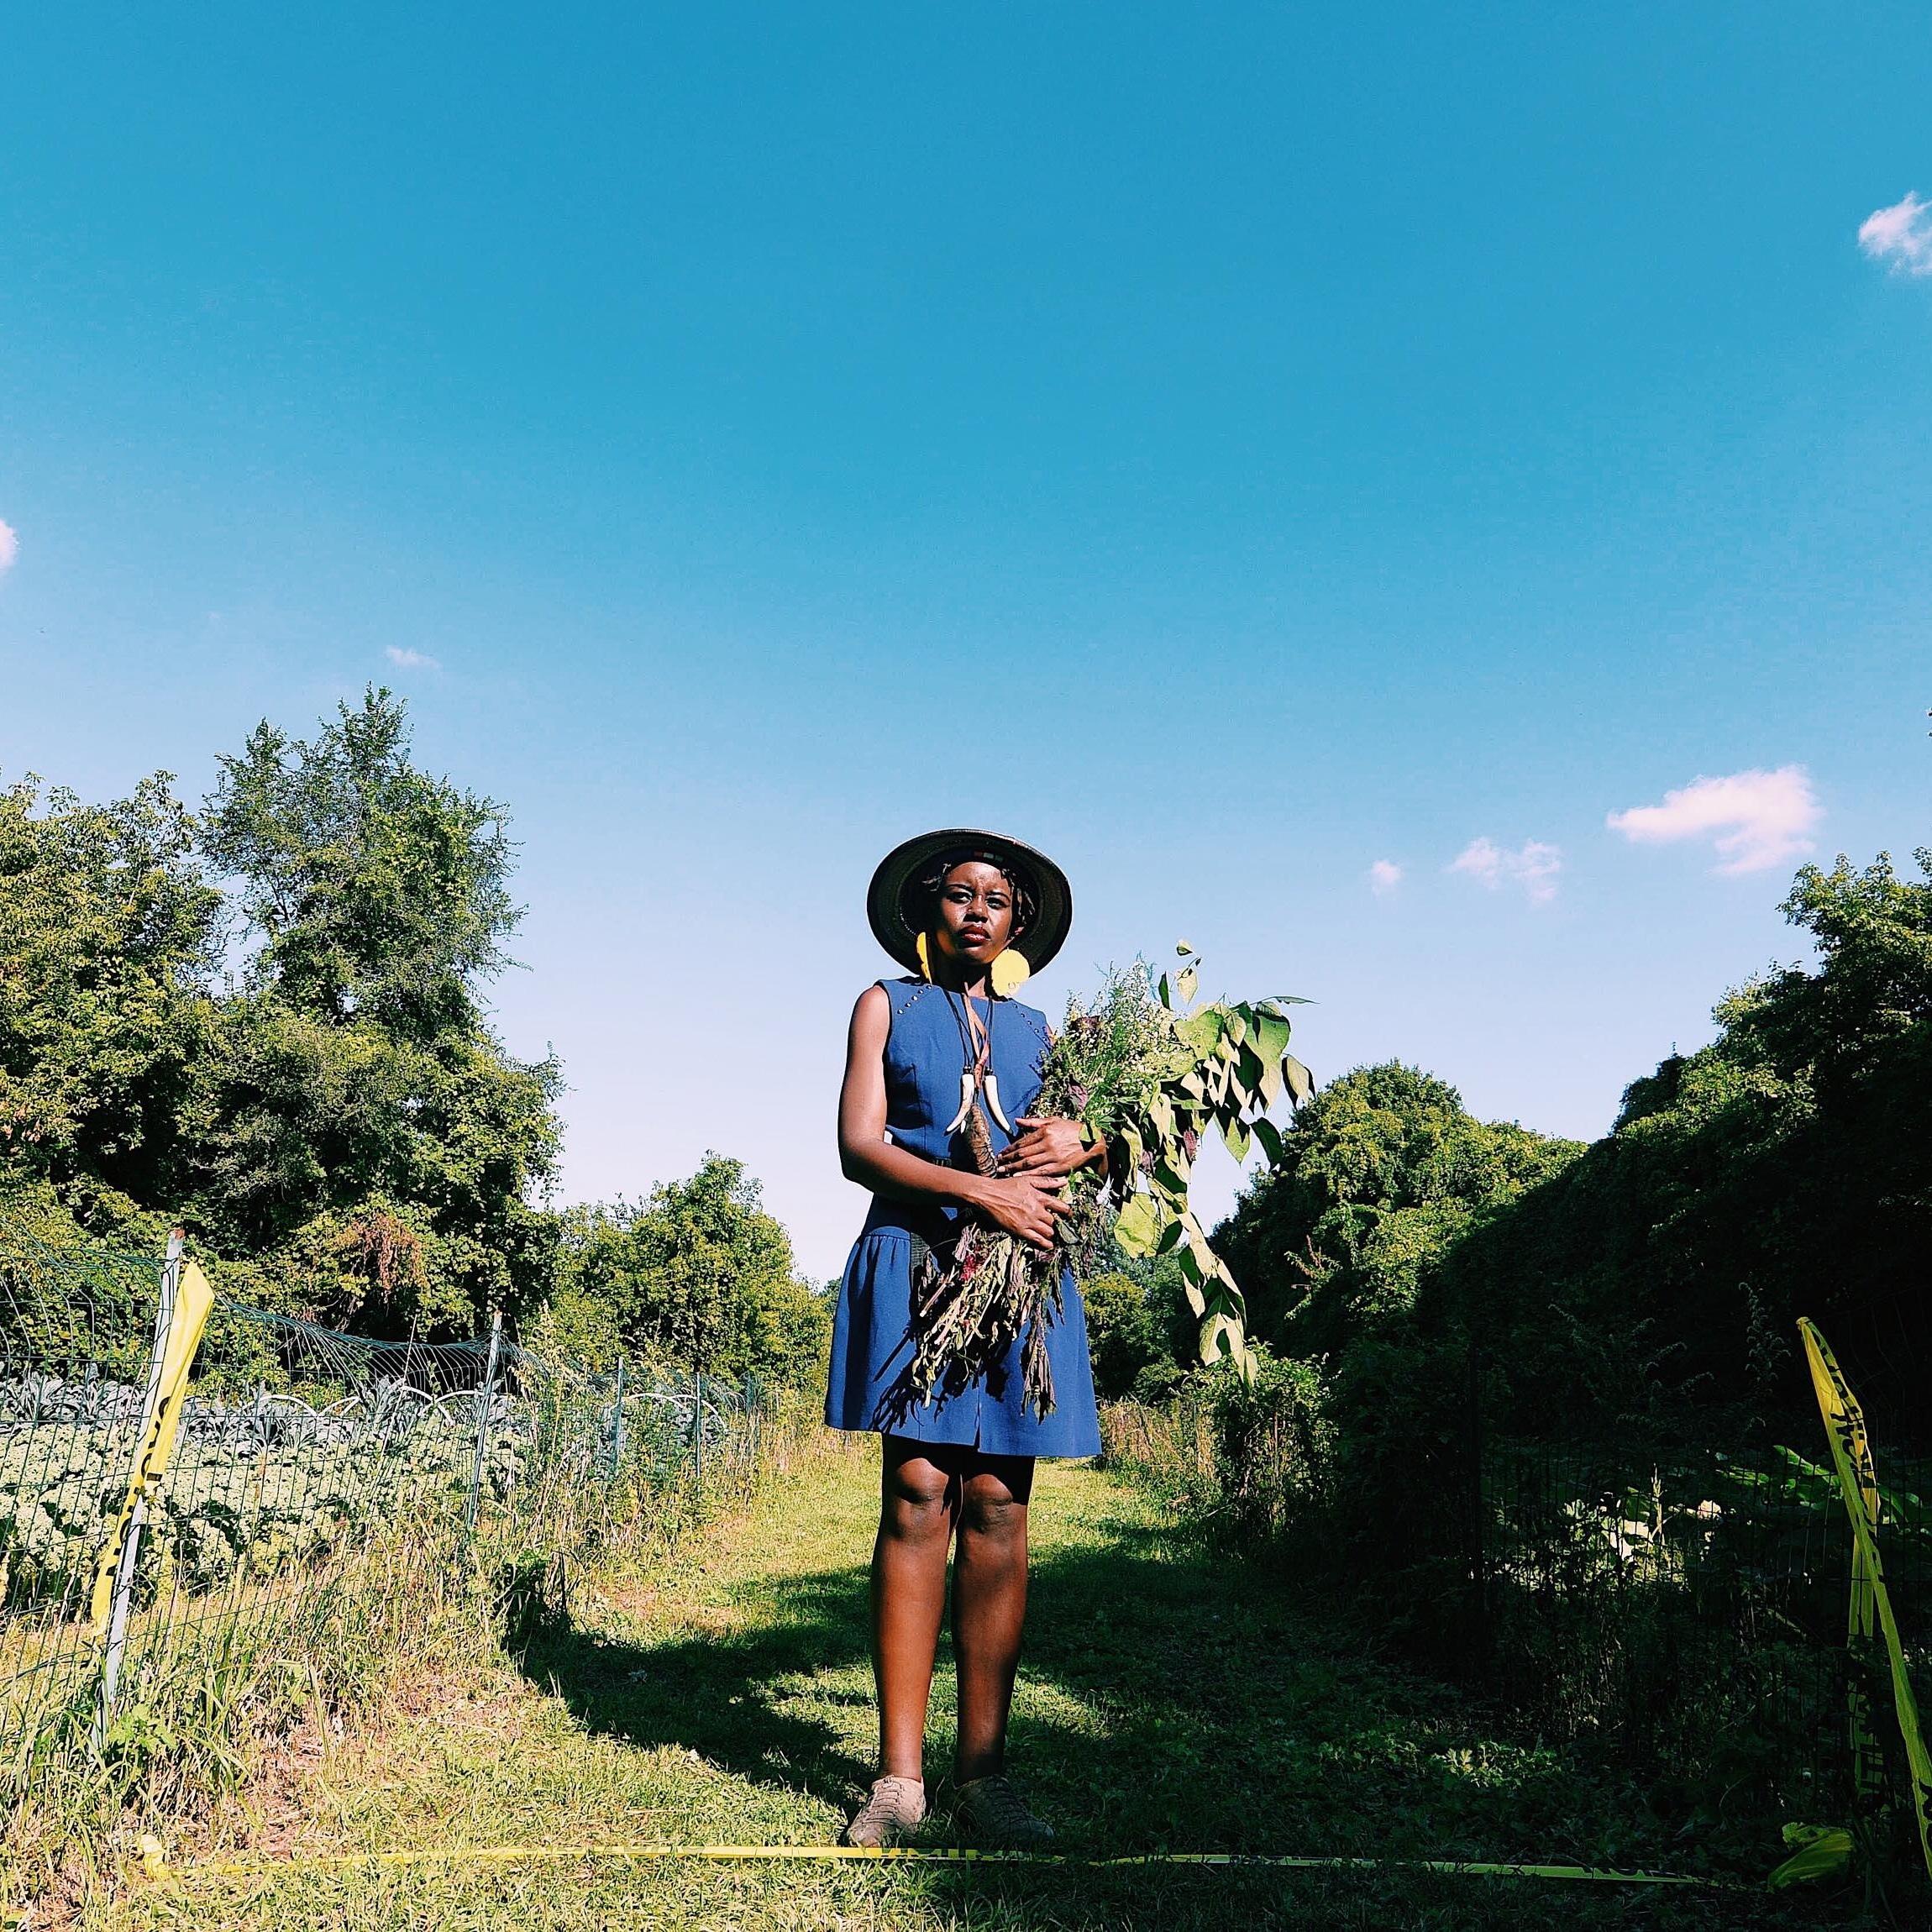 Farmer Atieno Kasagam holds produce in an urban farm in Detroit